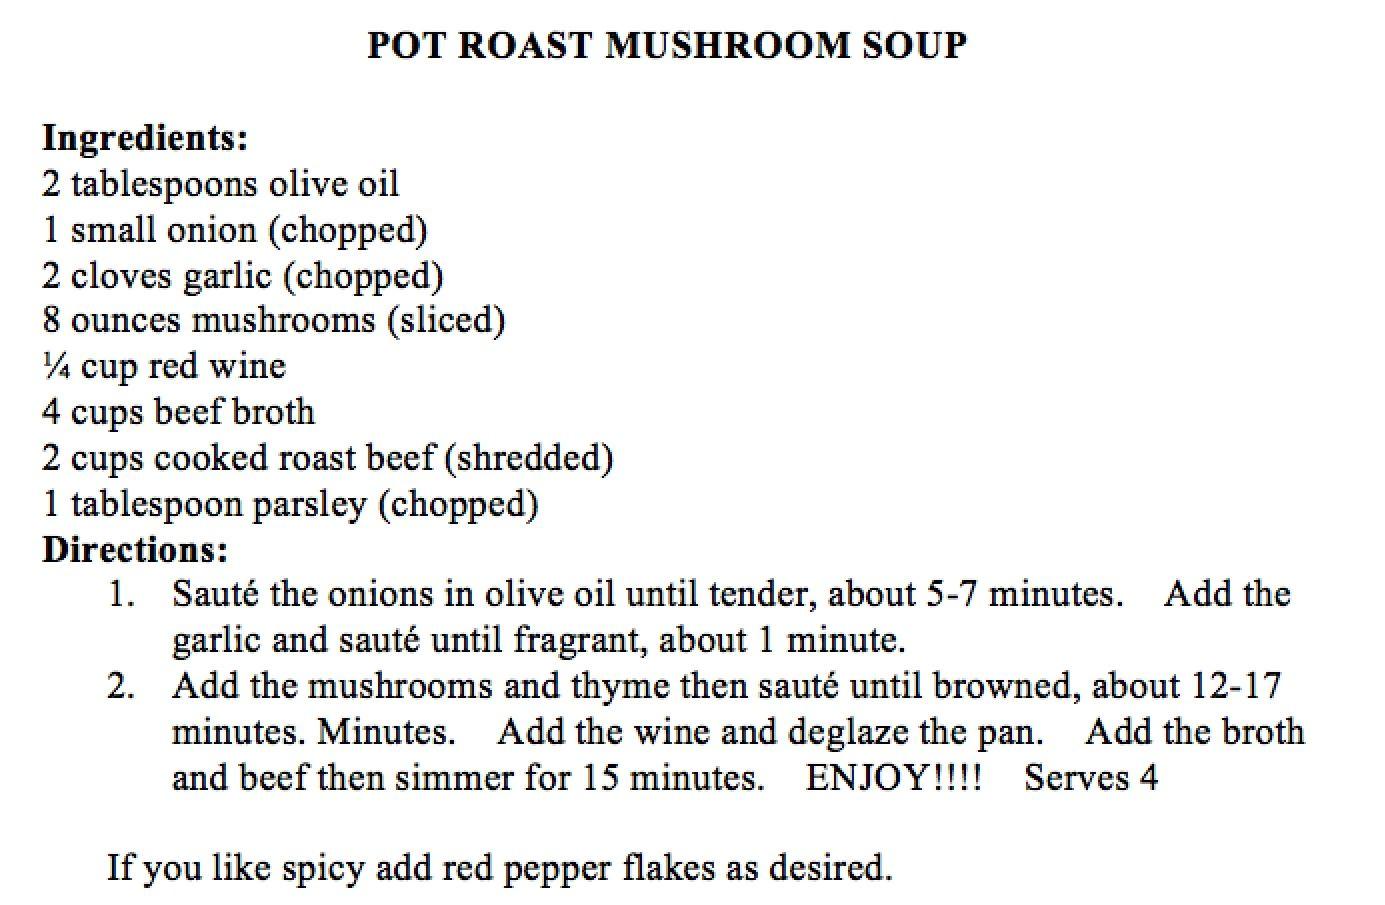 Pot Roast Mushroom Soup | Diet, Health & Fitness | Pinterest